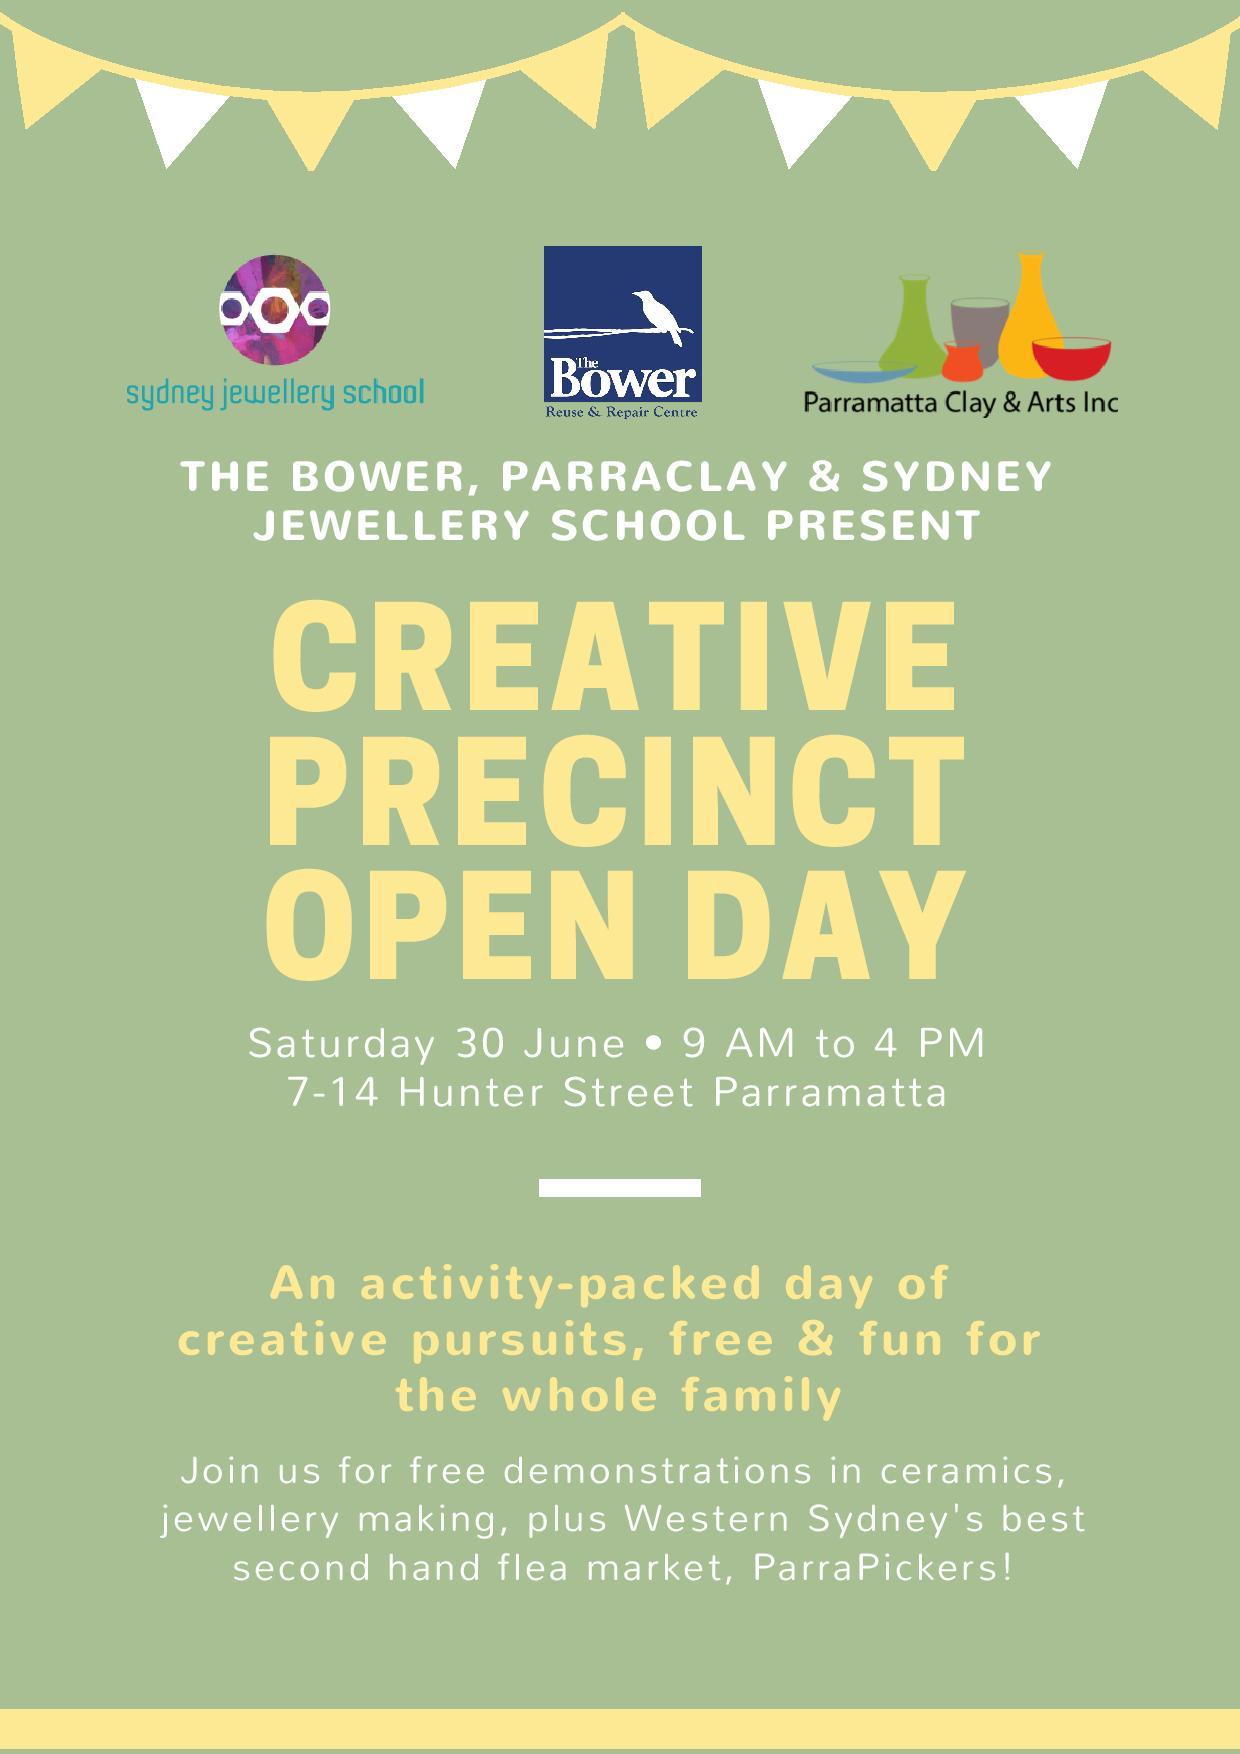 ParraPickers Creative Precinct Open Day